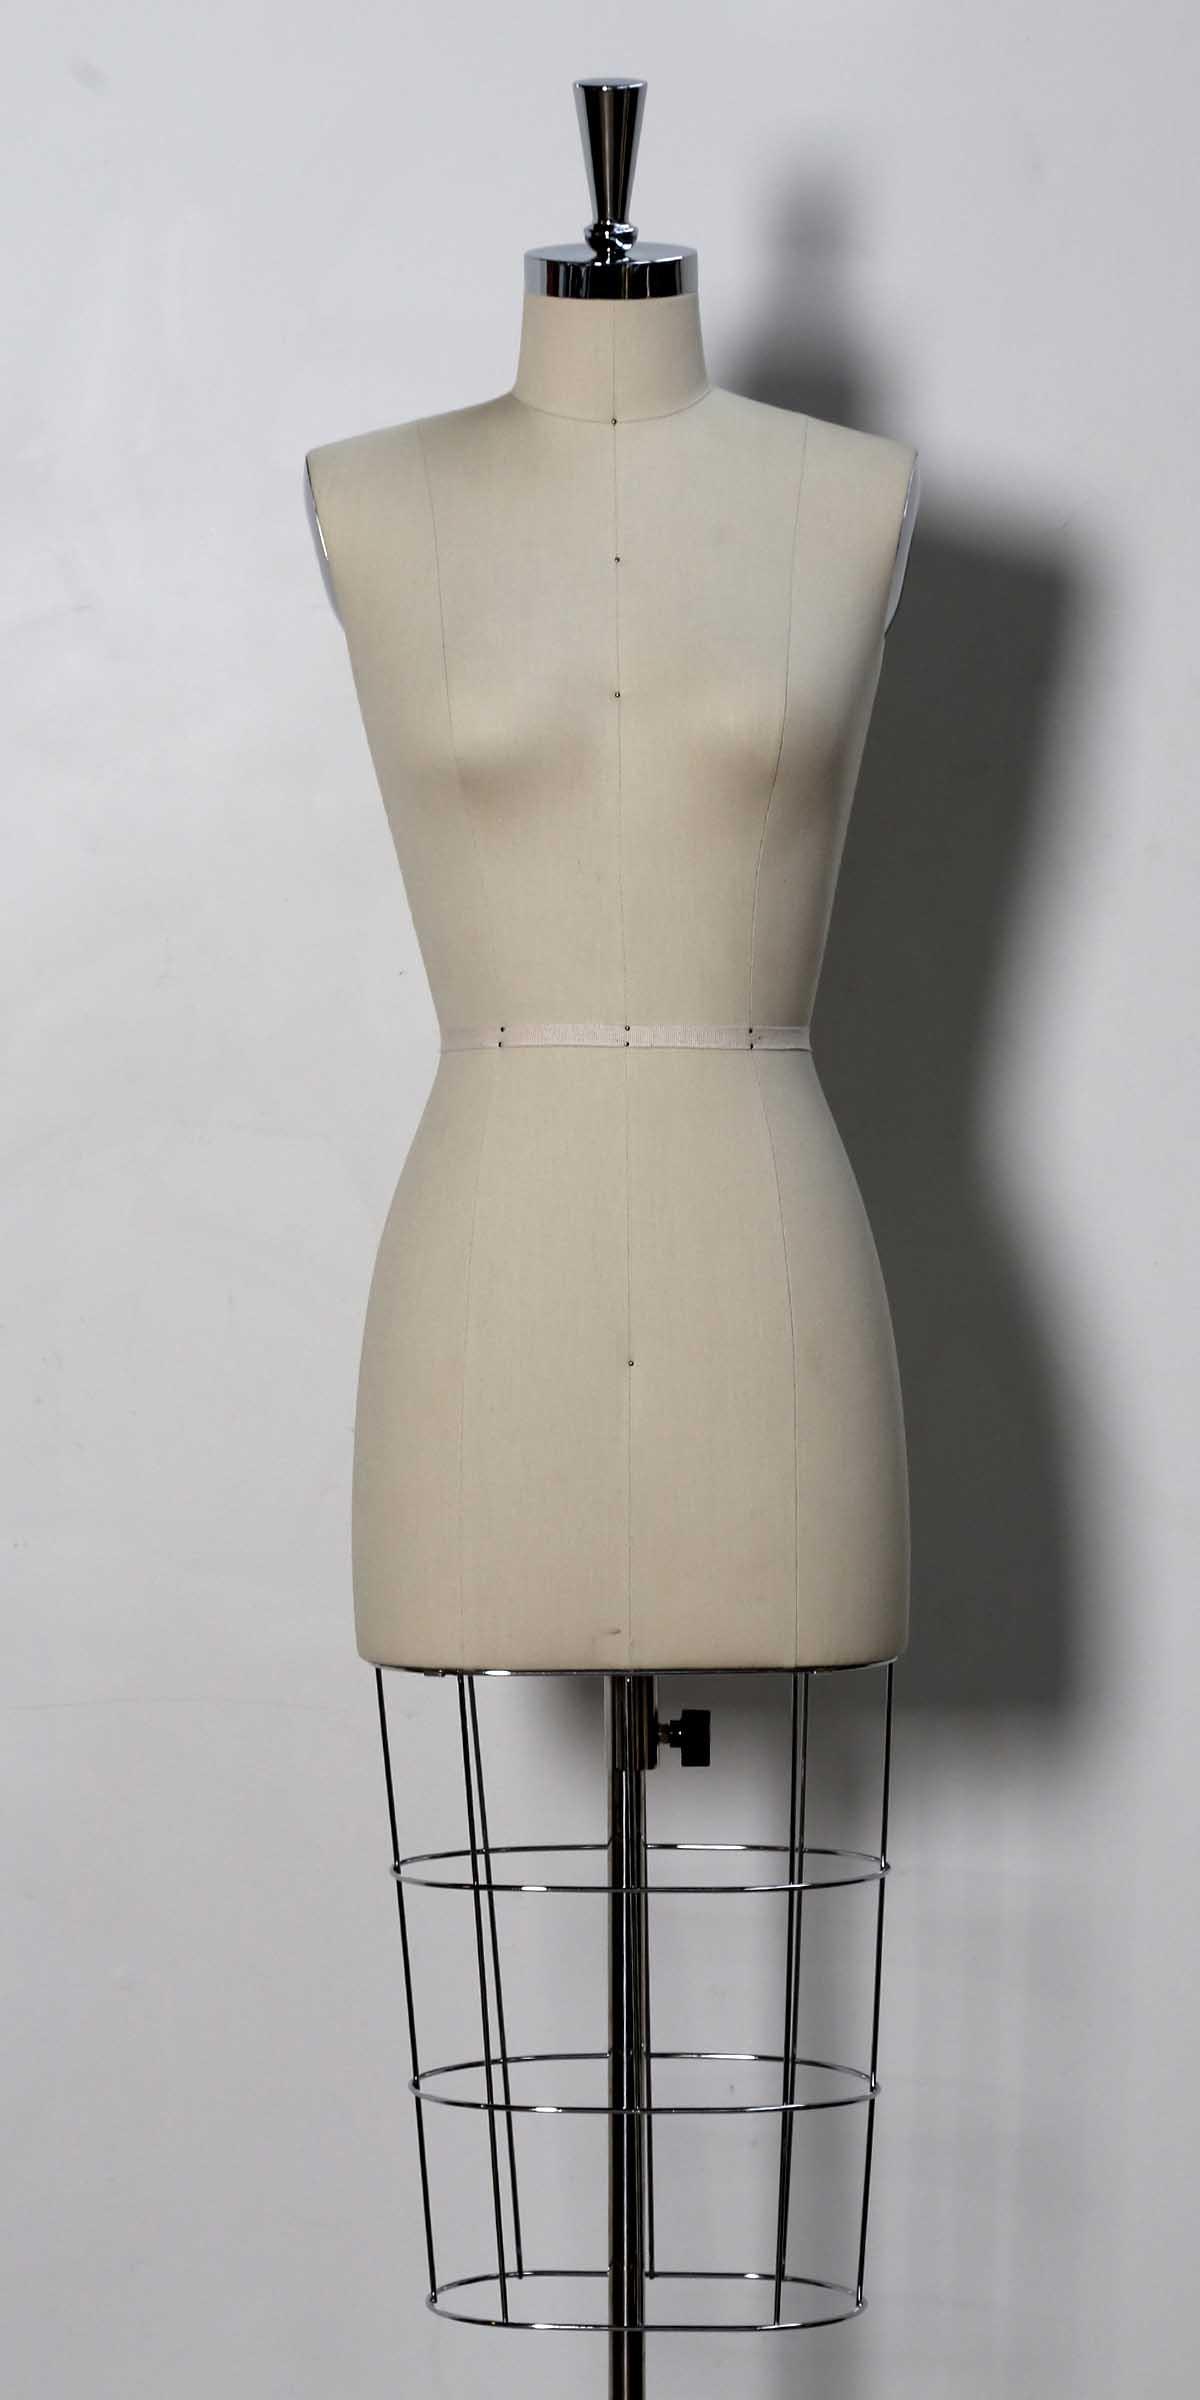 BFW-002 (A) Dressmaker Form 3_View 1